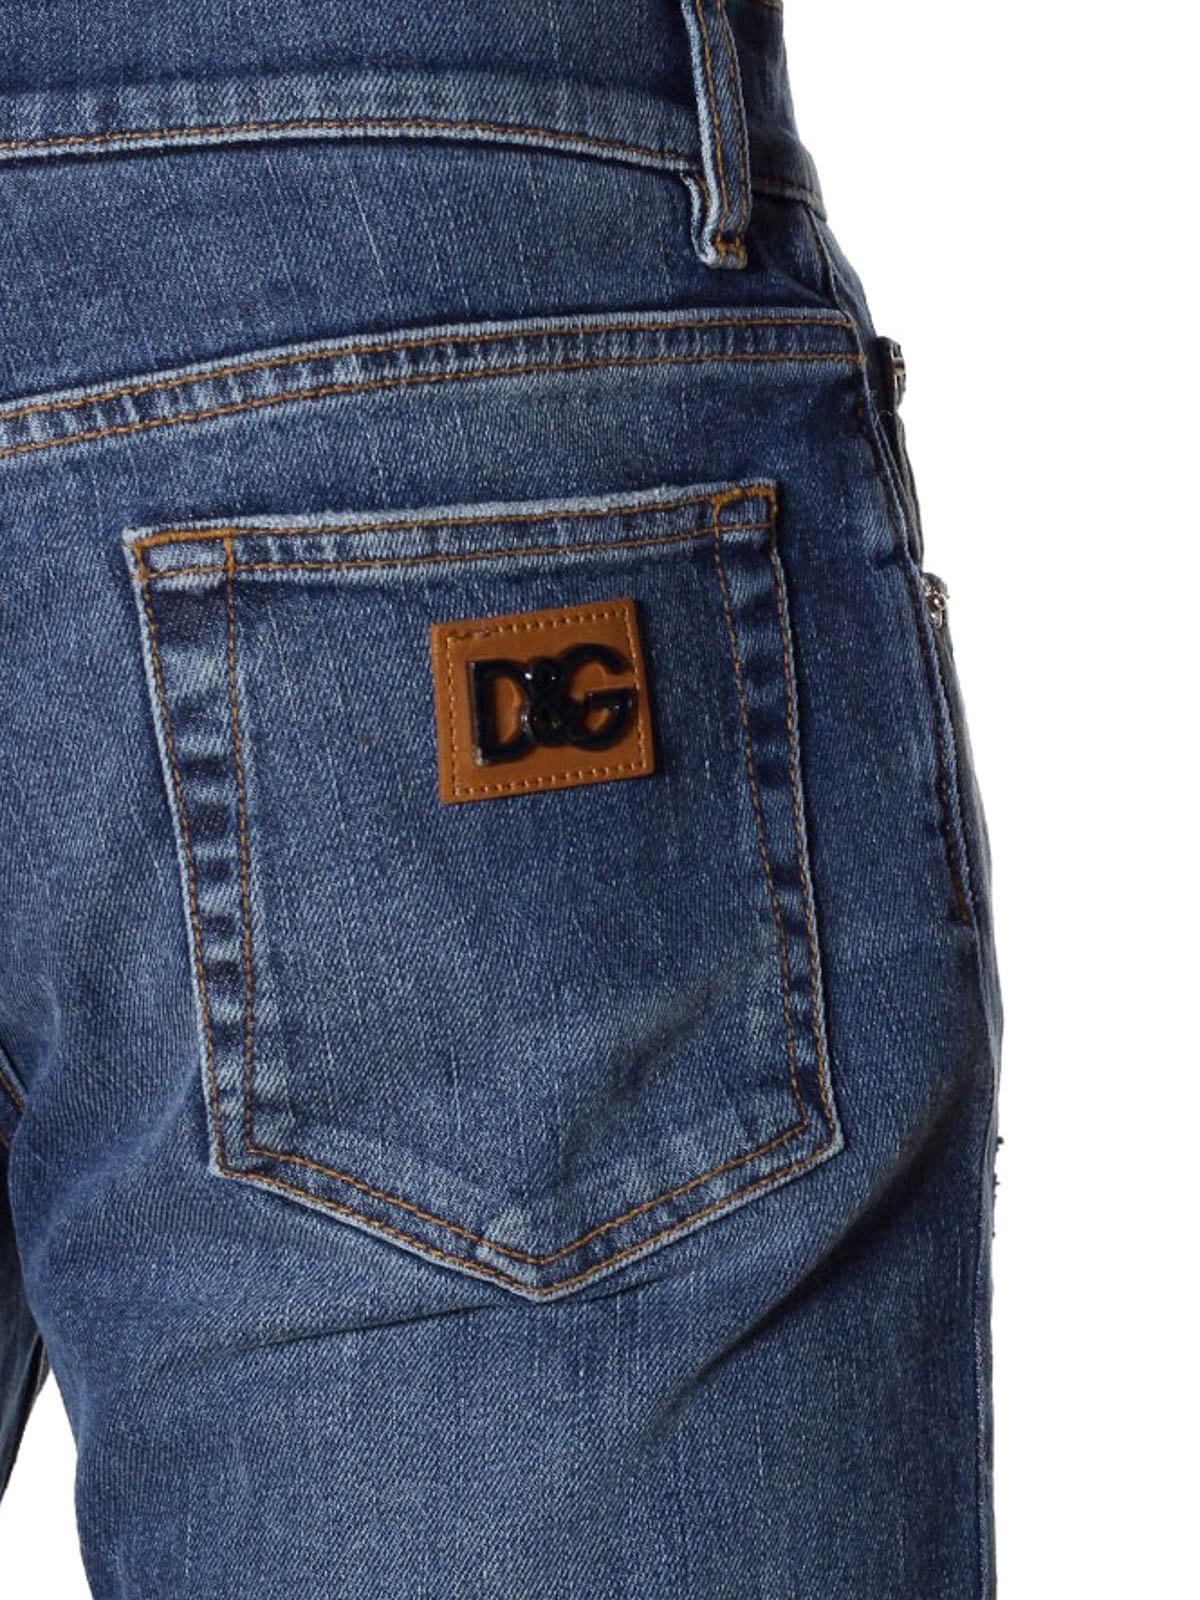 jeans cinque tasche in denim d lav dolce gabbana jeans dritti a sigaretta ikrix. Black Bedroom Furniture Sets. Home Design Ideas